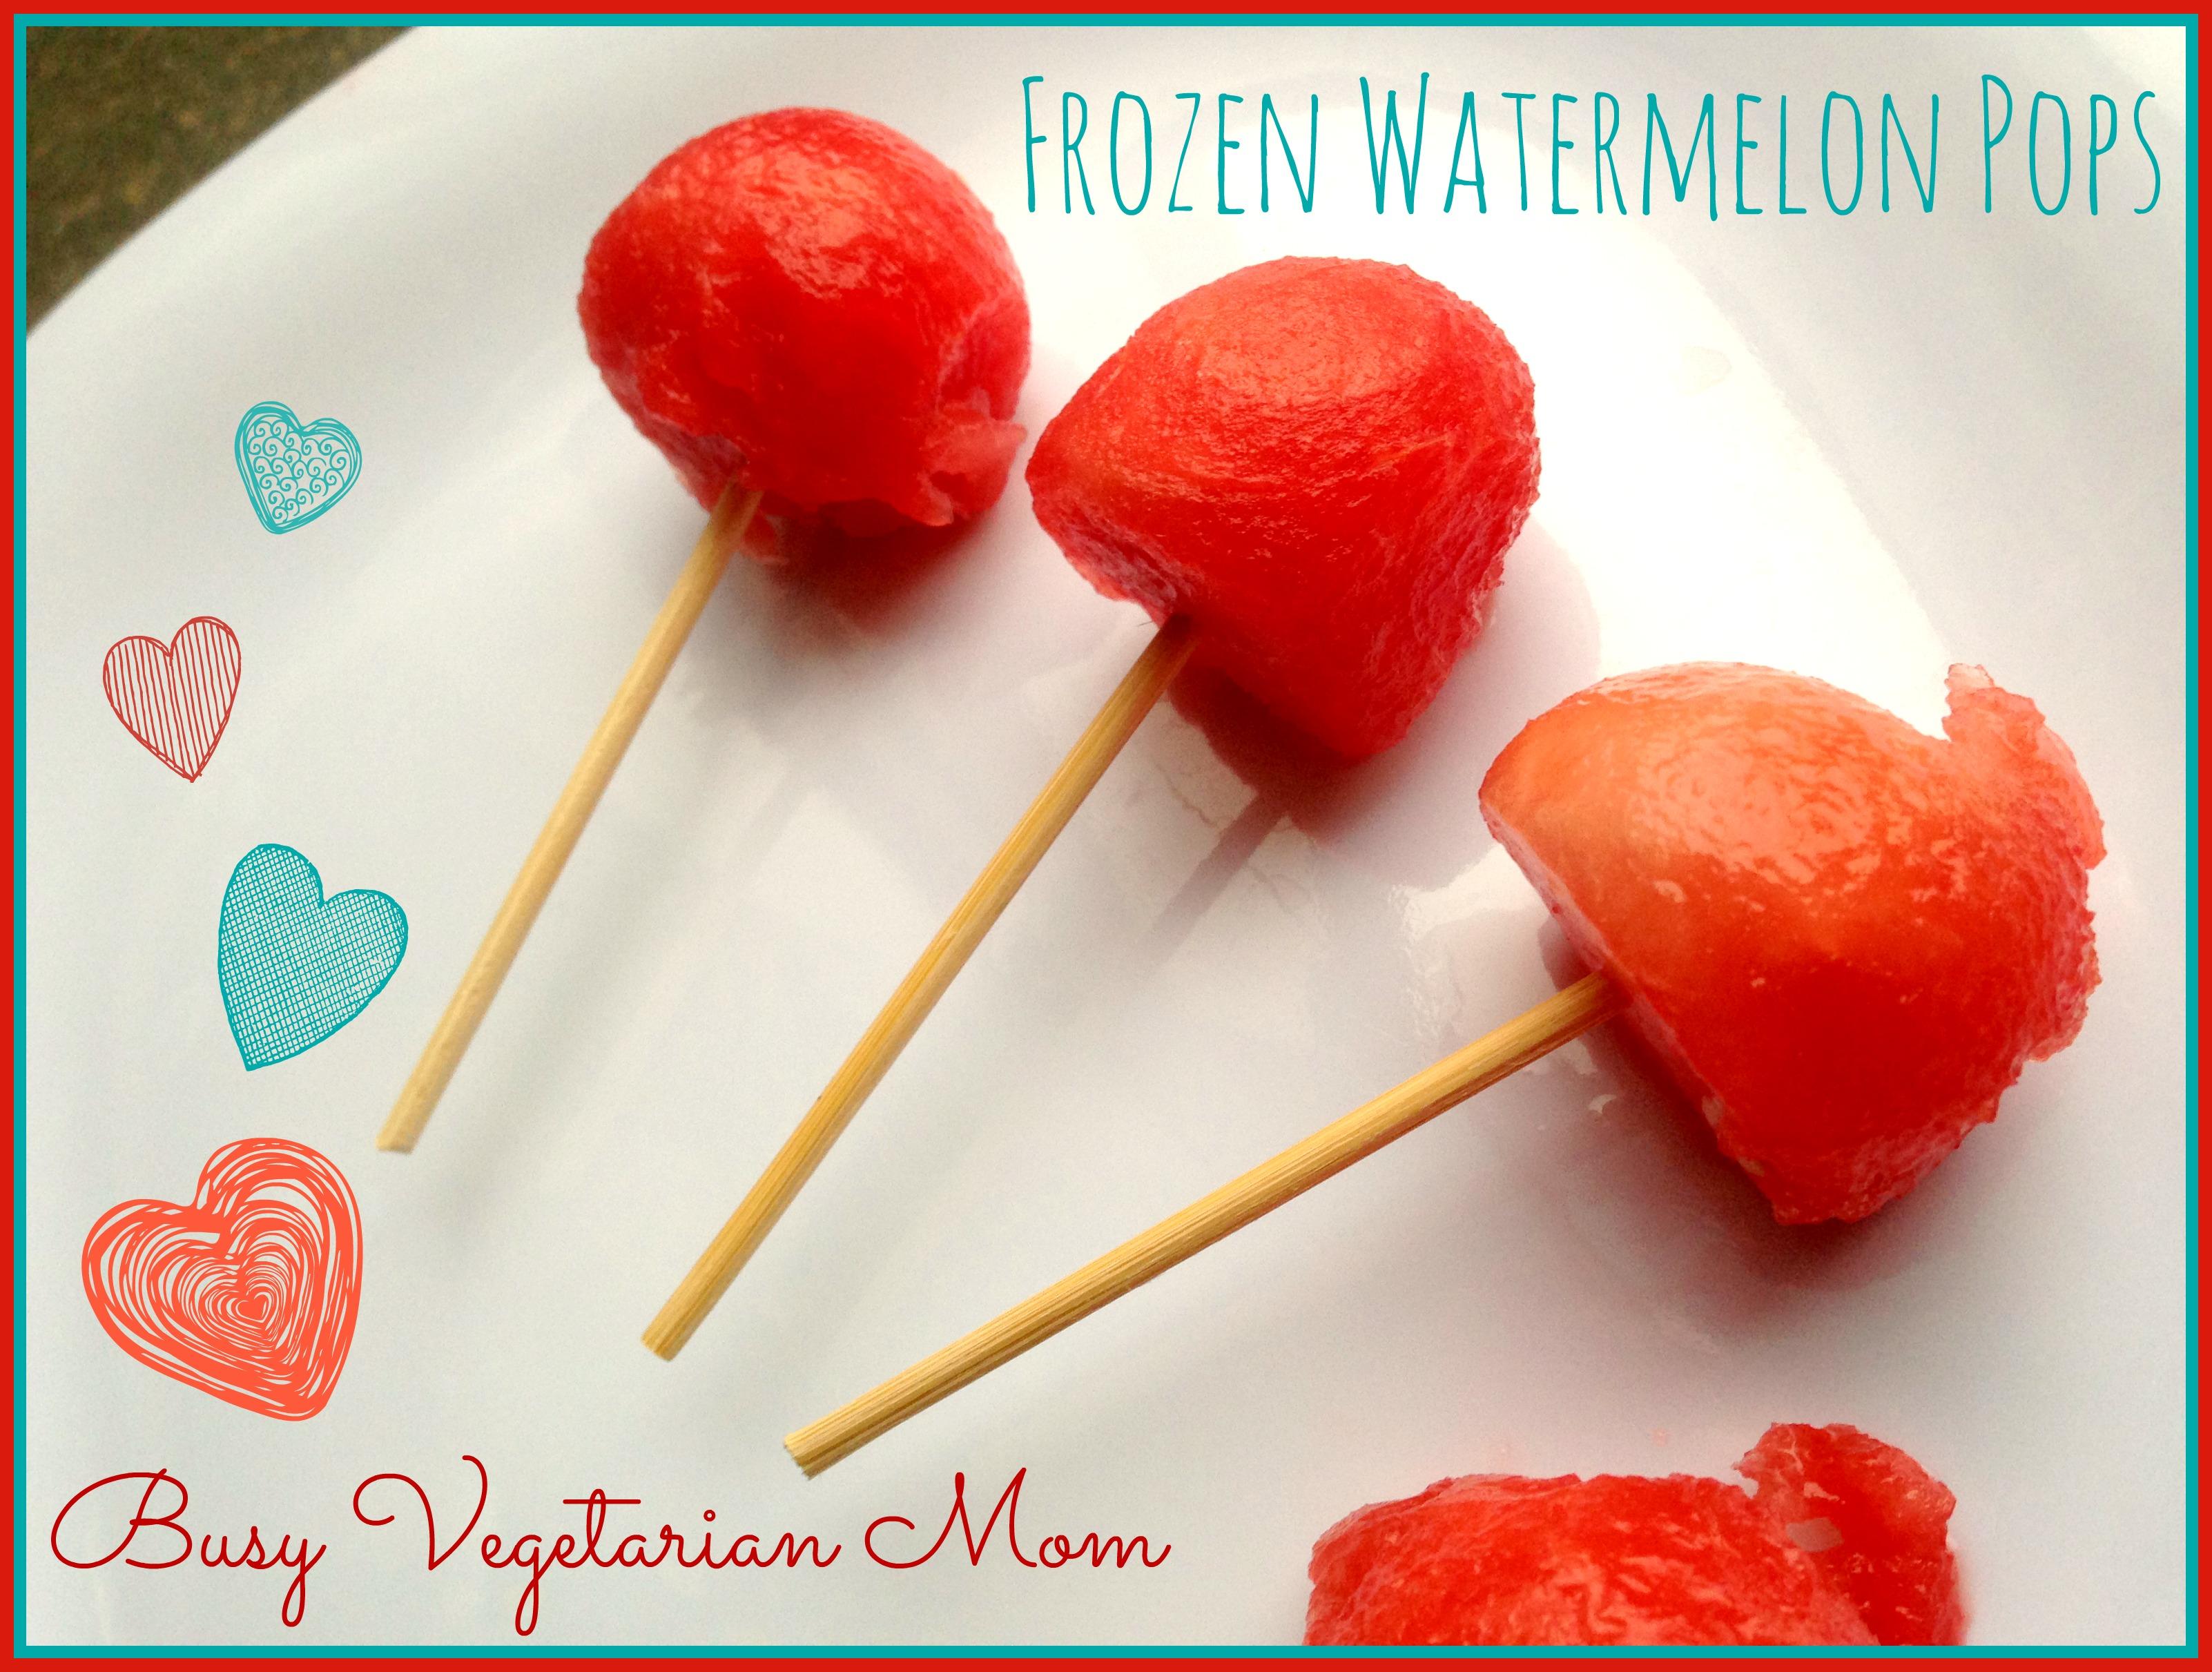 frozen watermelon pops simply skewer and freeze fruits like watermelon ...